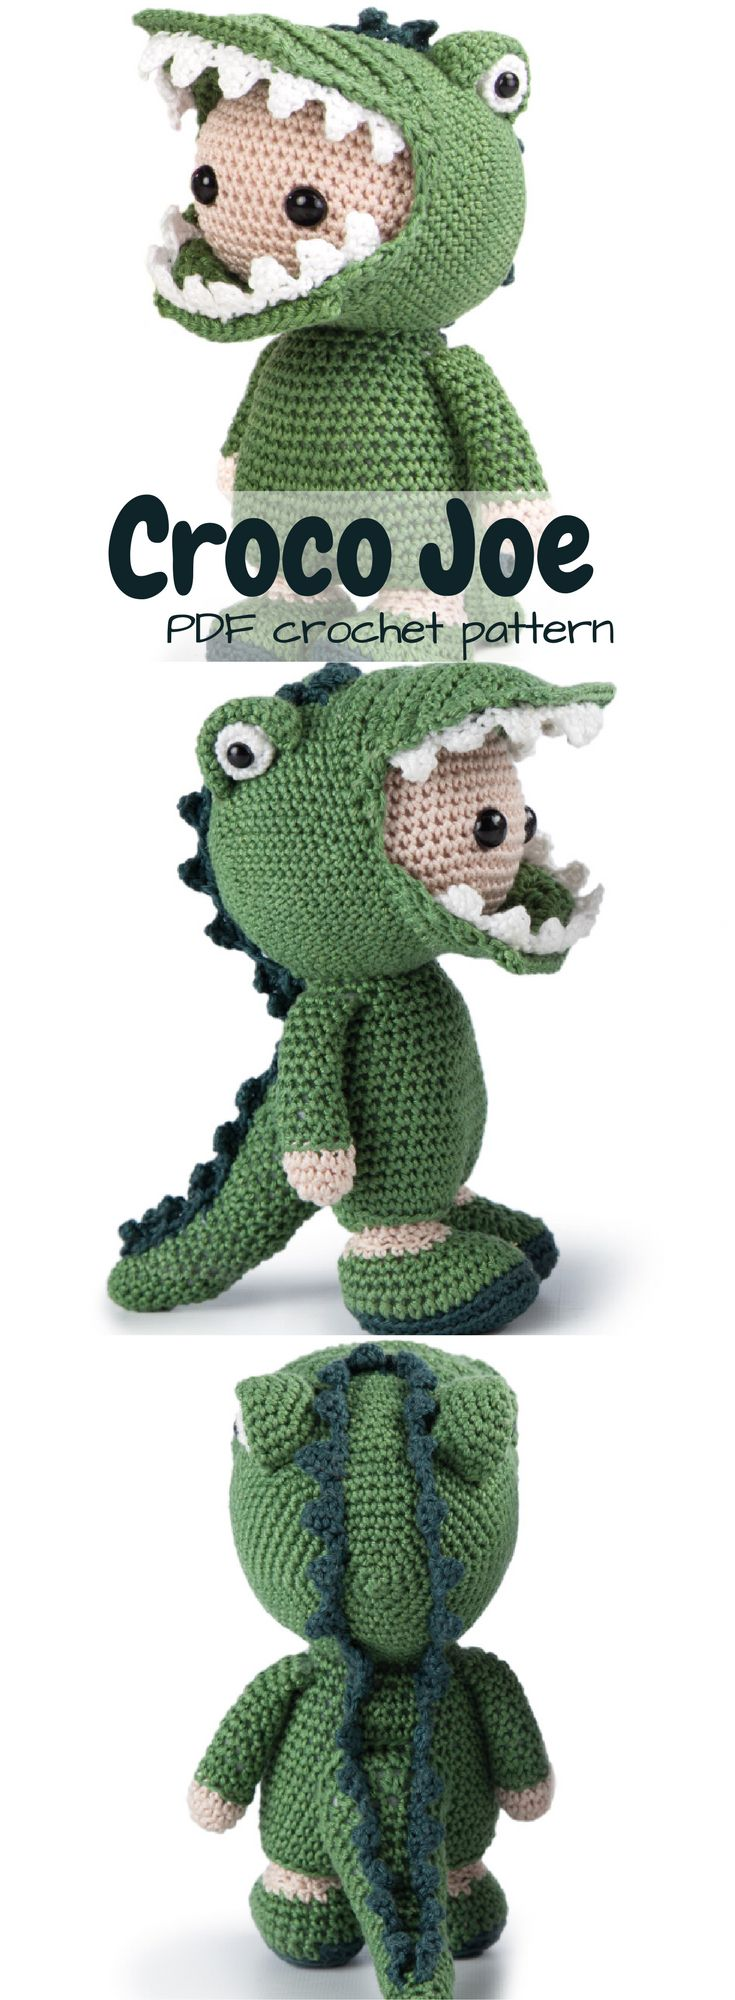 Croco Joe, an adorable doll in a crocodile costume! So much fun! Beautifully designed amigurumi toy crochet pattern for this fun doll. #etsy #ad #pdf #crochetpattern #instantdownload